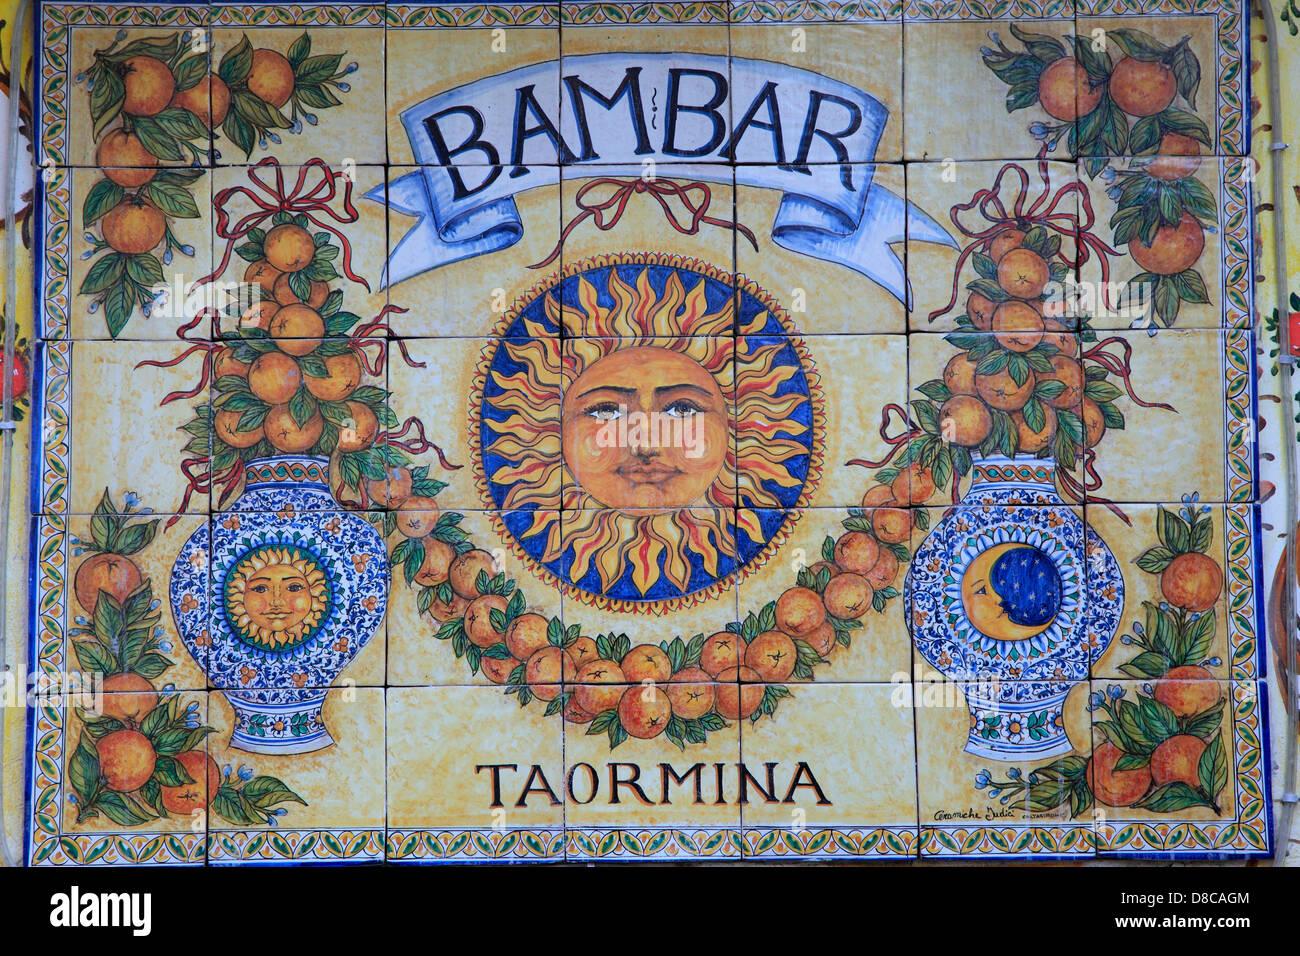 Litalia sicilia taormina piastrelle in ceramica shop segno foto